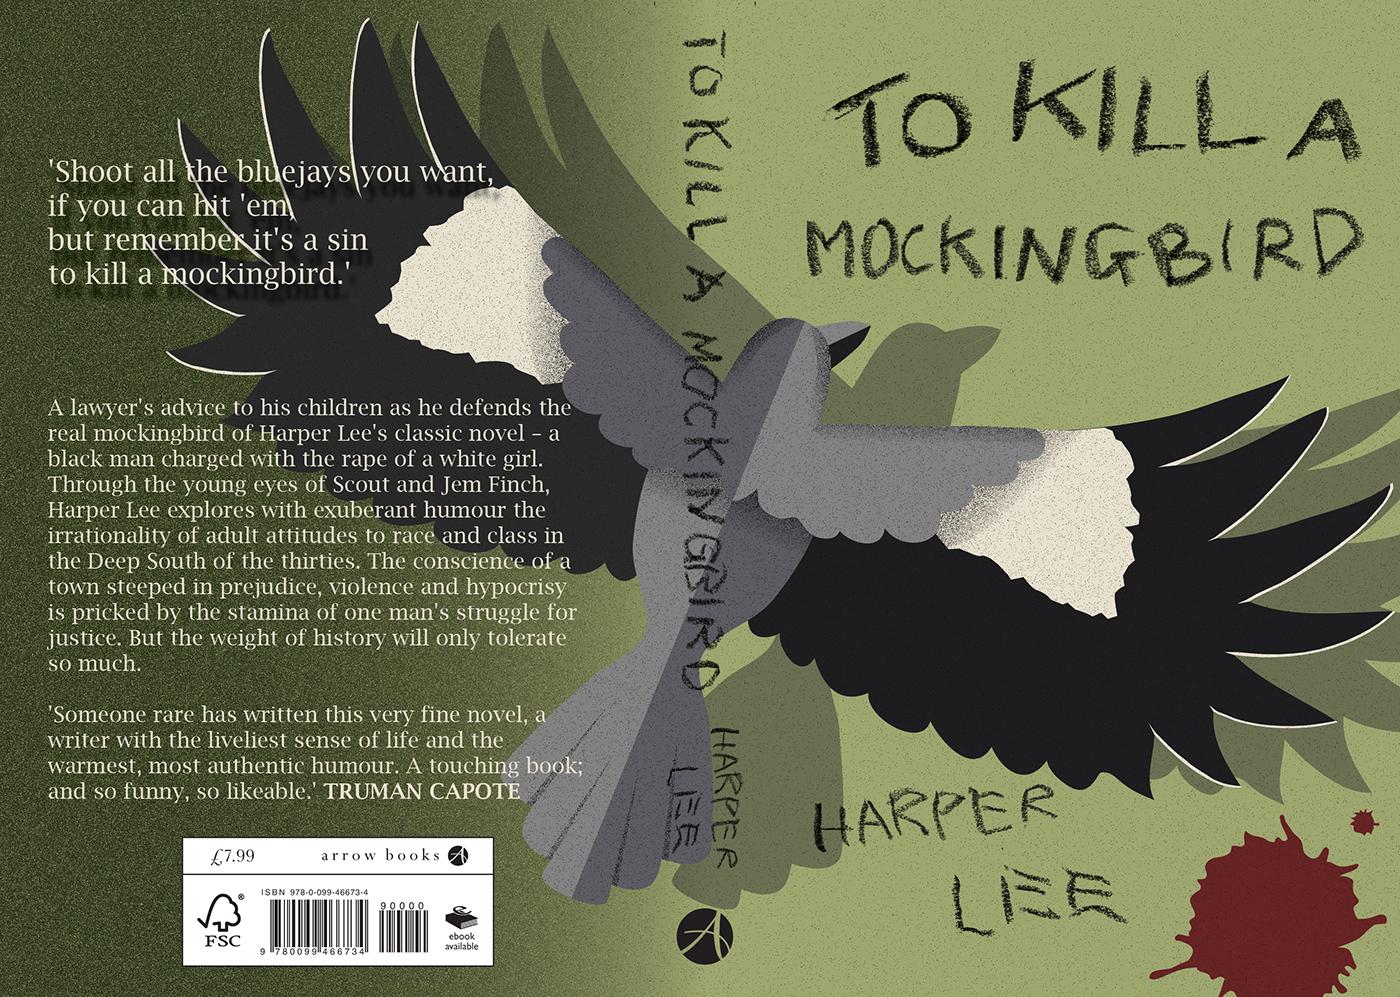 to kill a mockingbird cover page